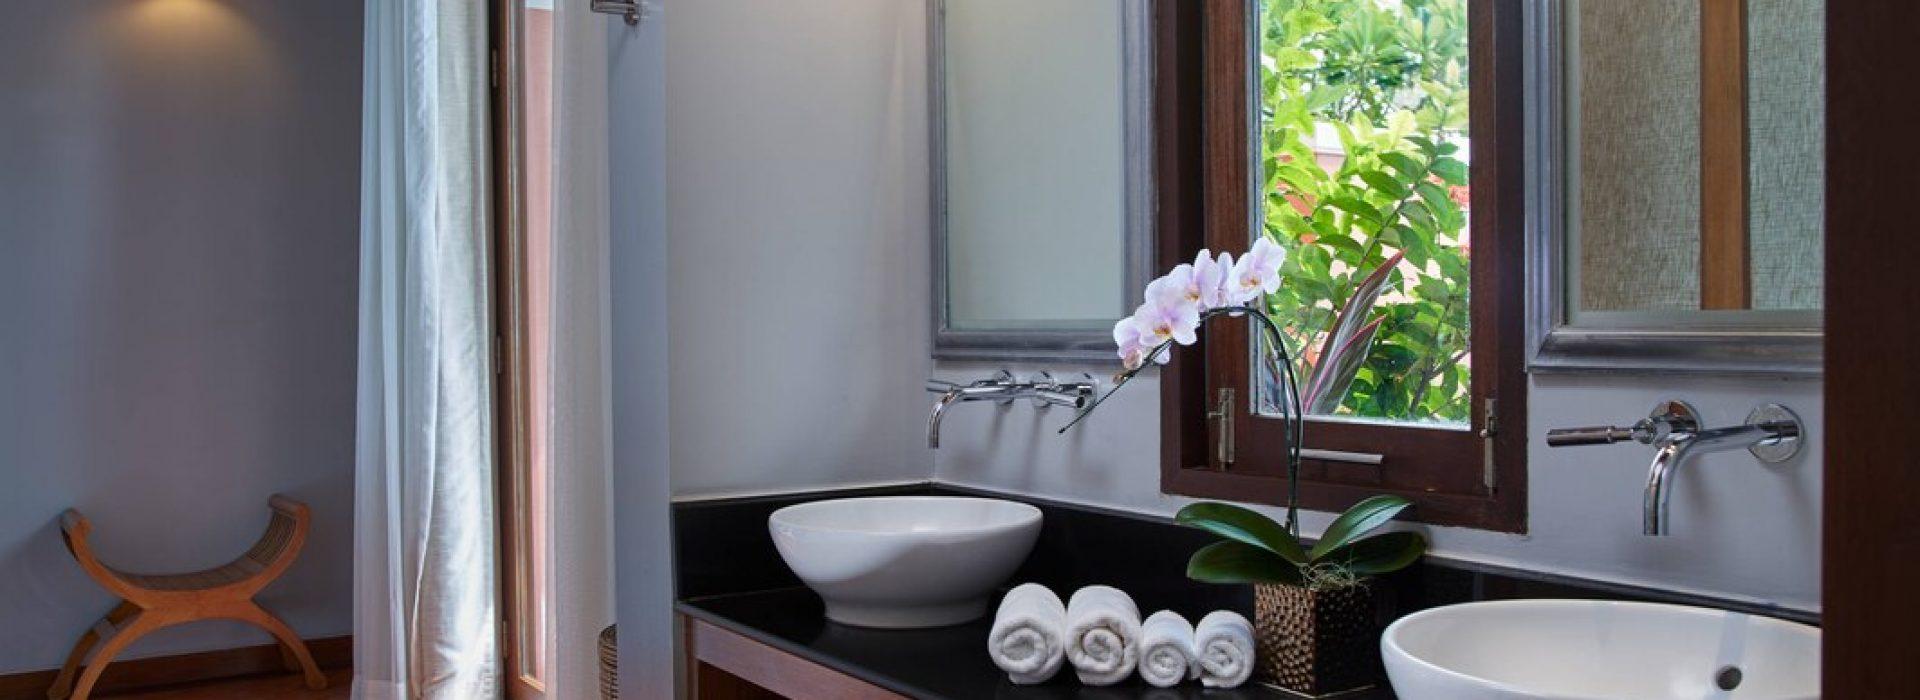 usmbr-private-bathroom-9340-hor-wide